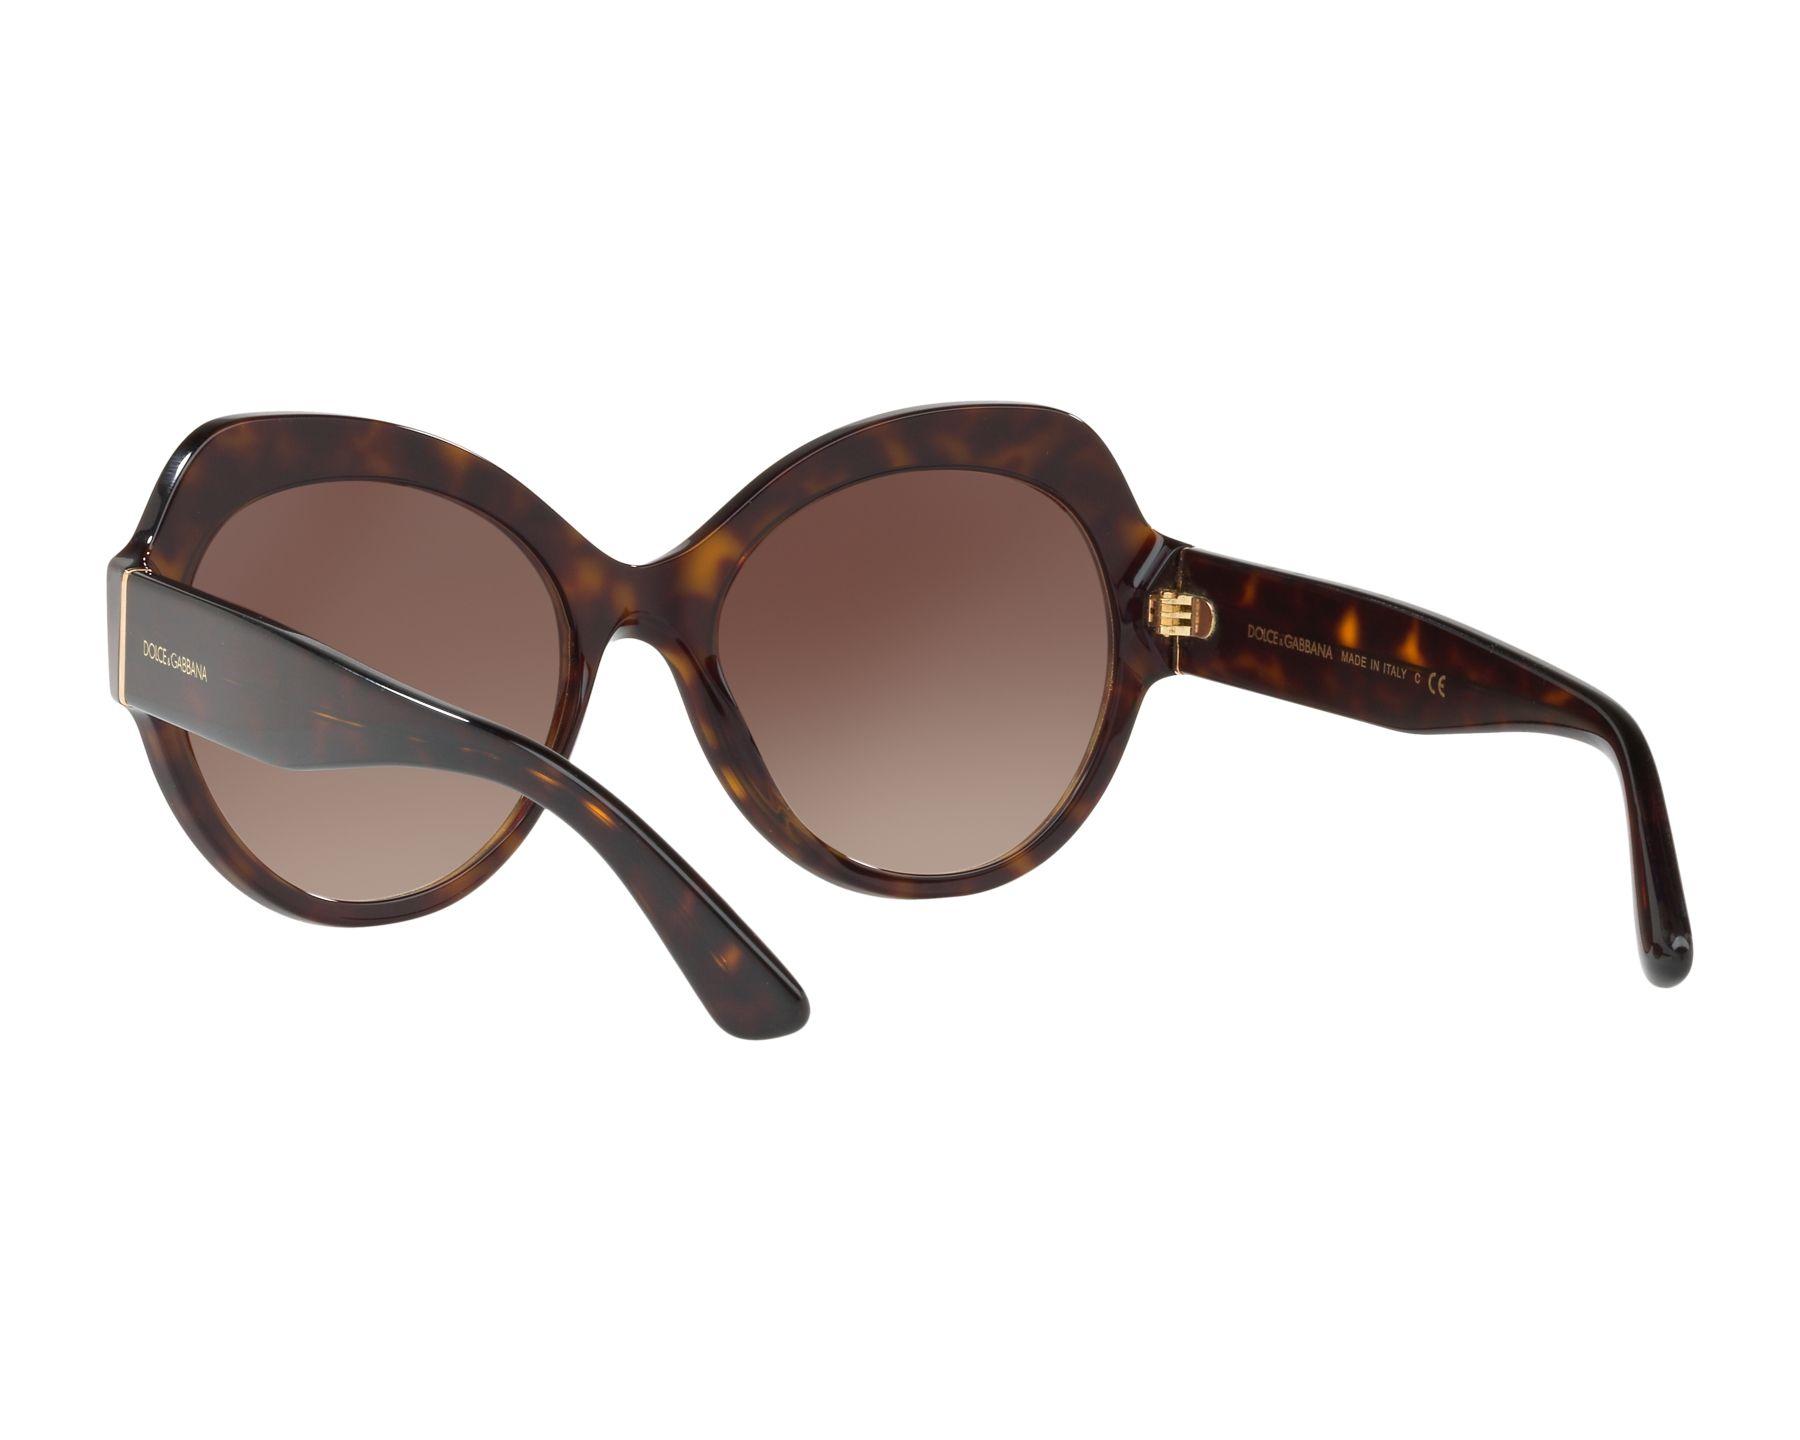 2eecc38a40 Sunglasses Dolce & Gabbana DG-4320 502/13 - Havana 360 degree view 6